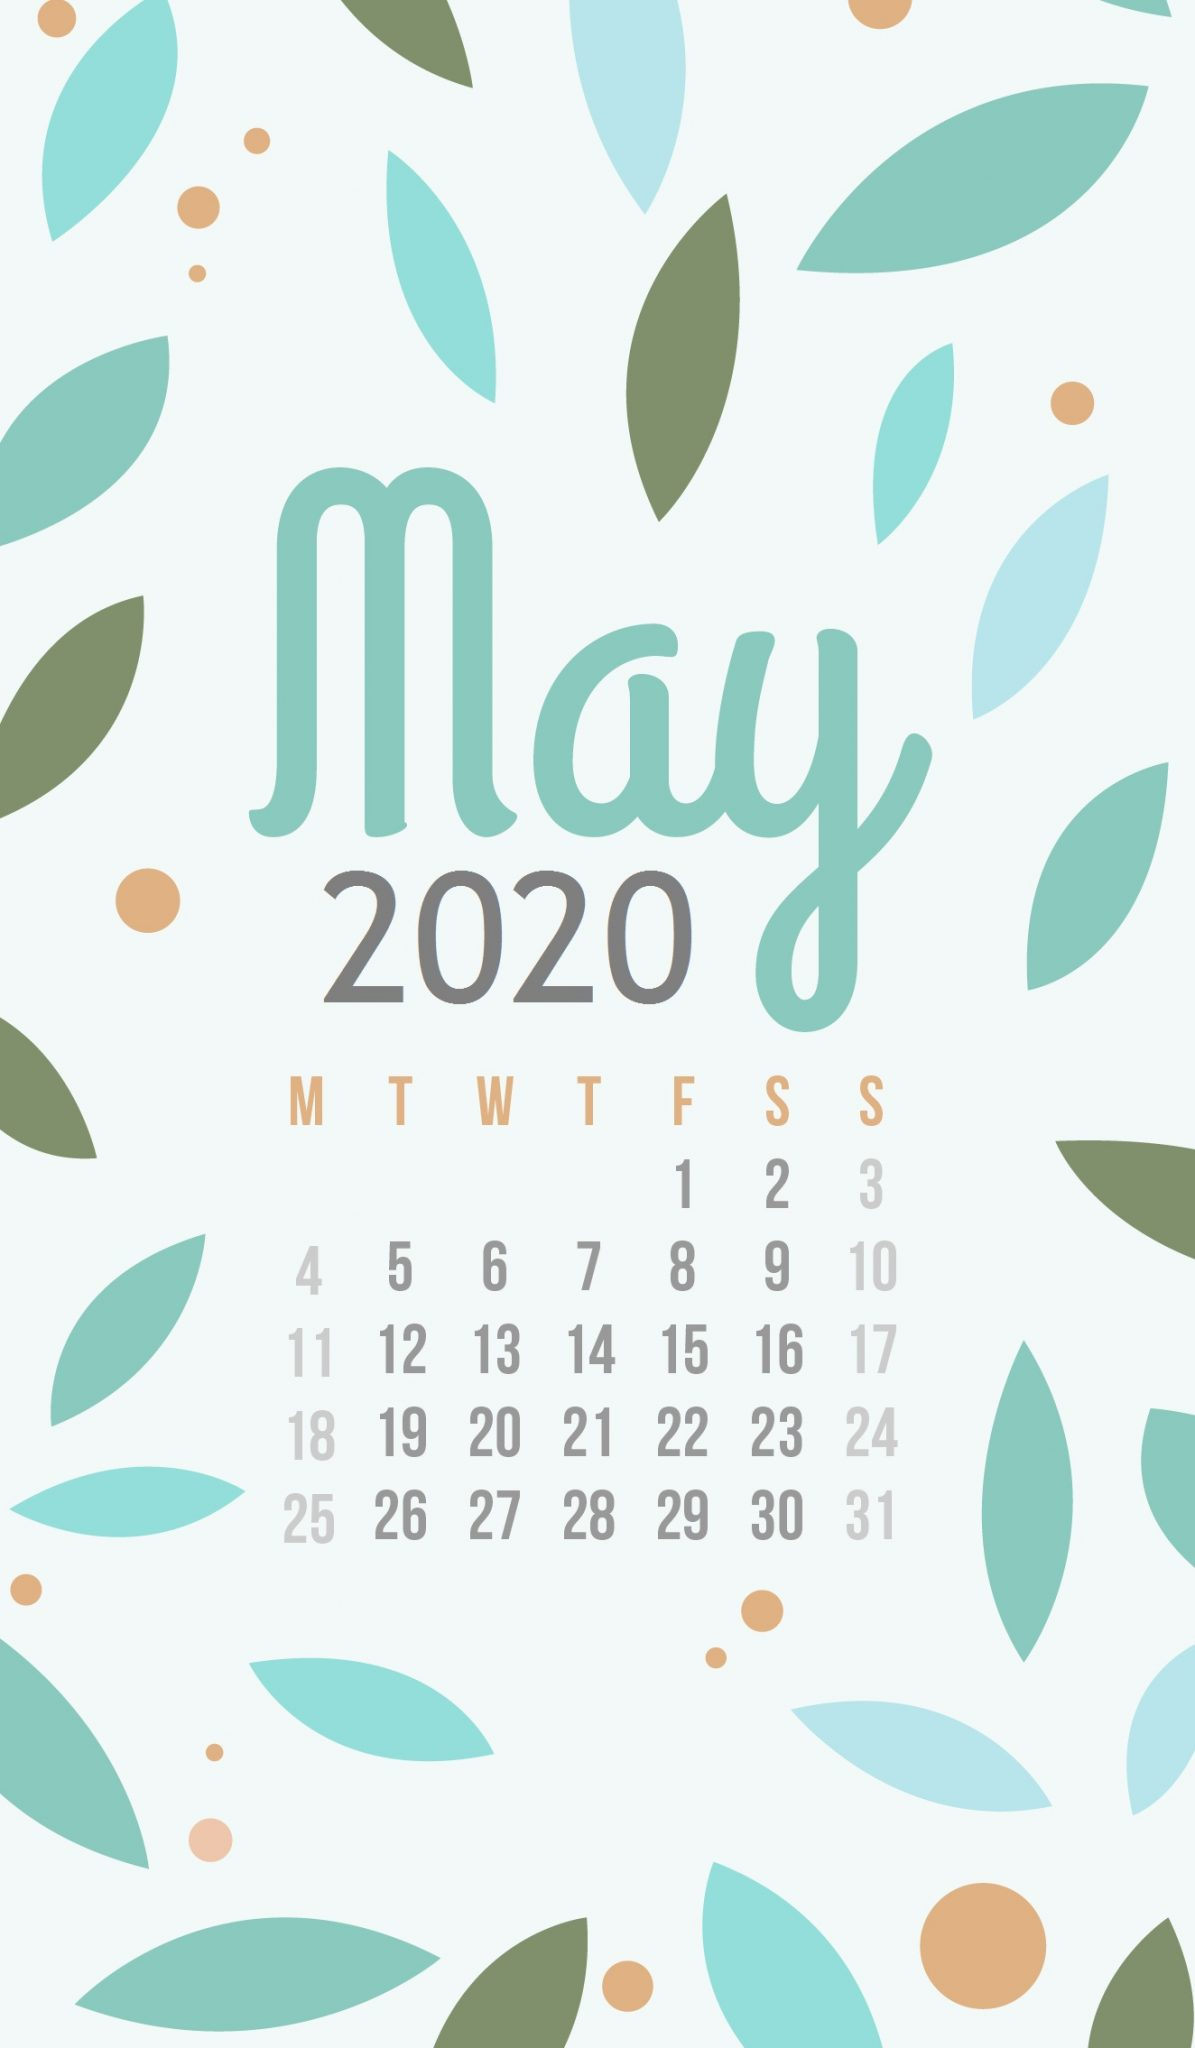 Iphone May 2020 Wallpaper | Calendar 2019